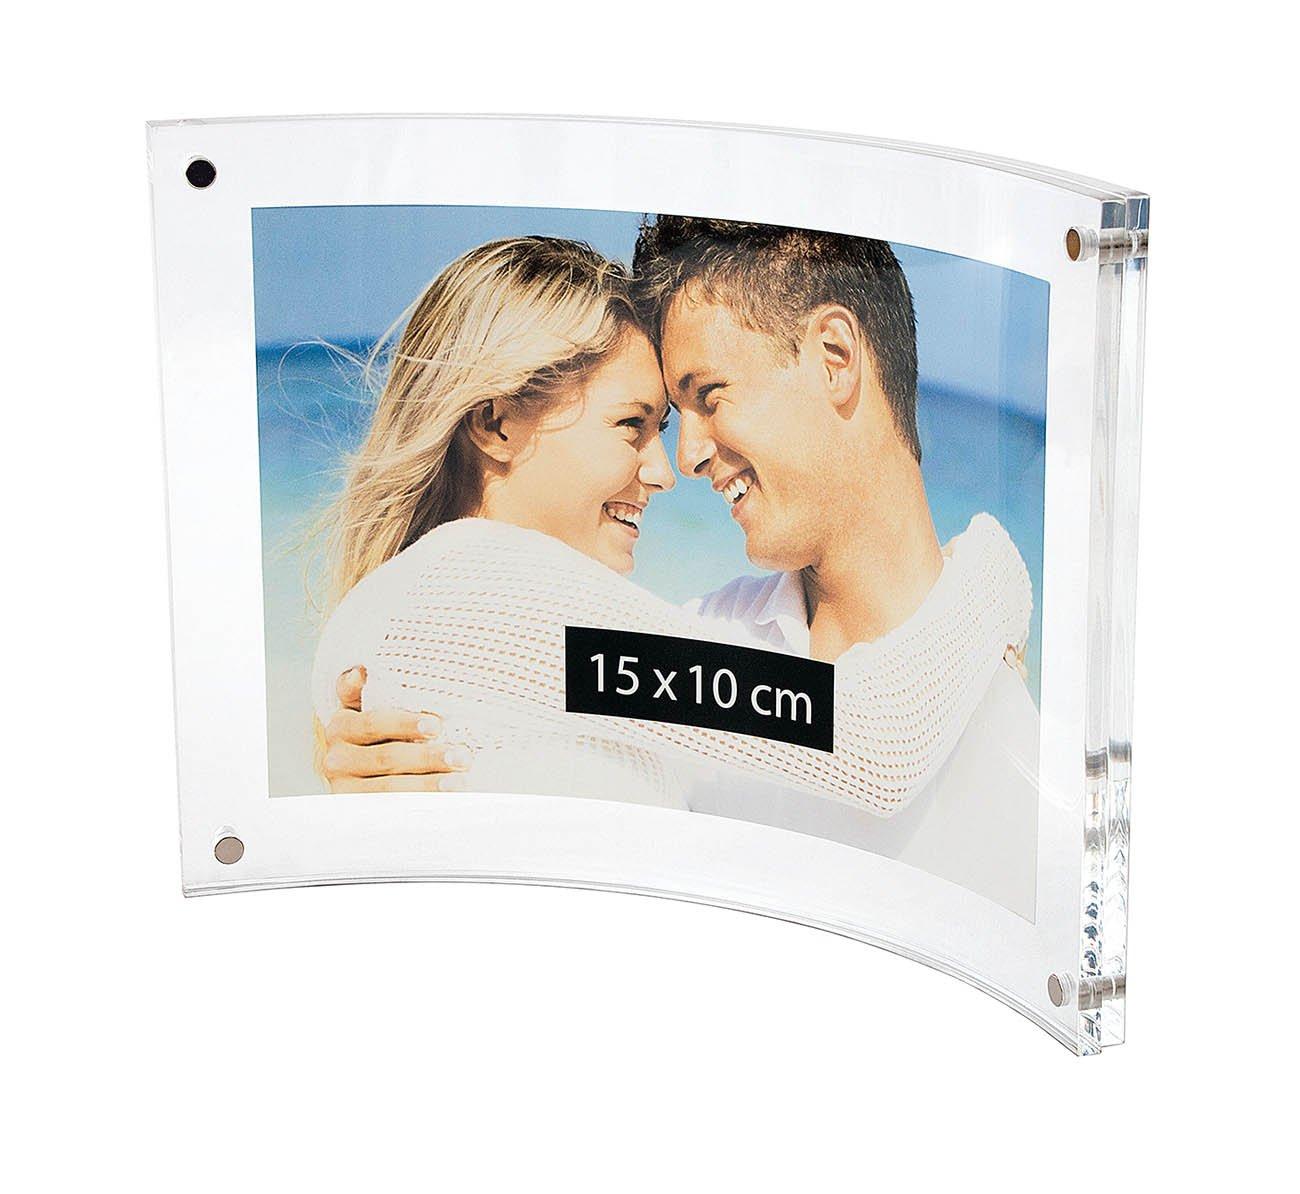 Wedo 601516 Acryl Fotorahmen (Cristallic, mit Magnetverschluss ...